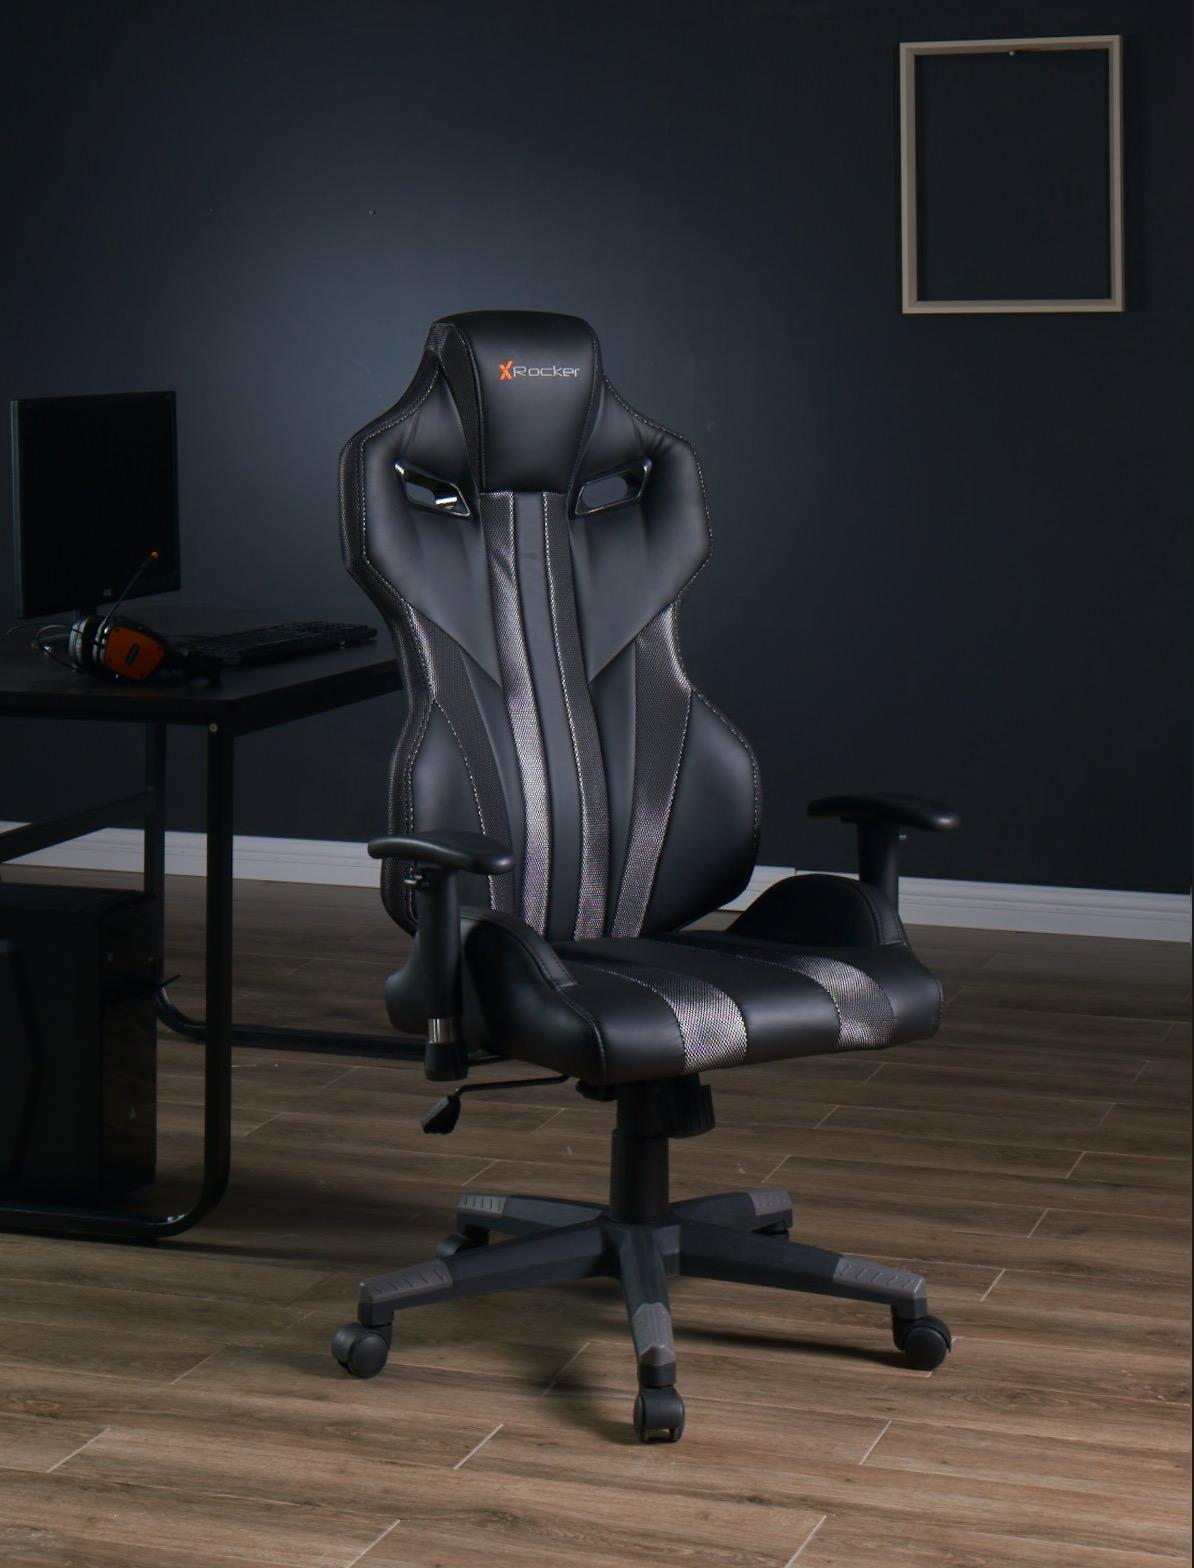 X Rocker Gaming Furniture & Accessories